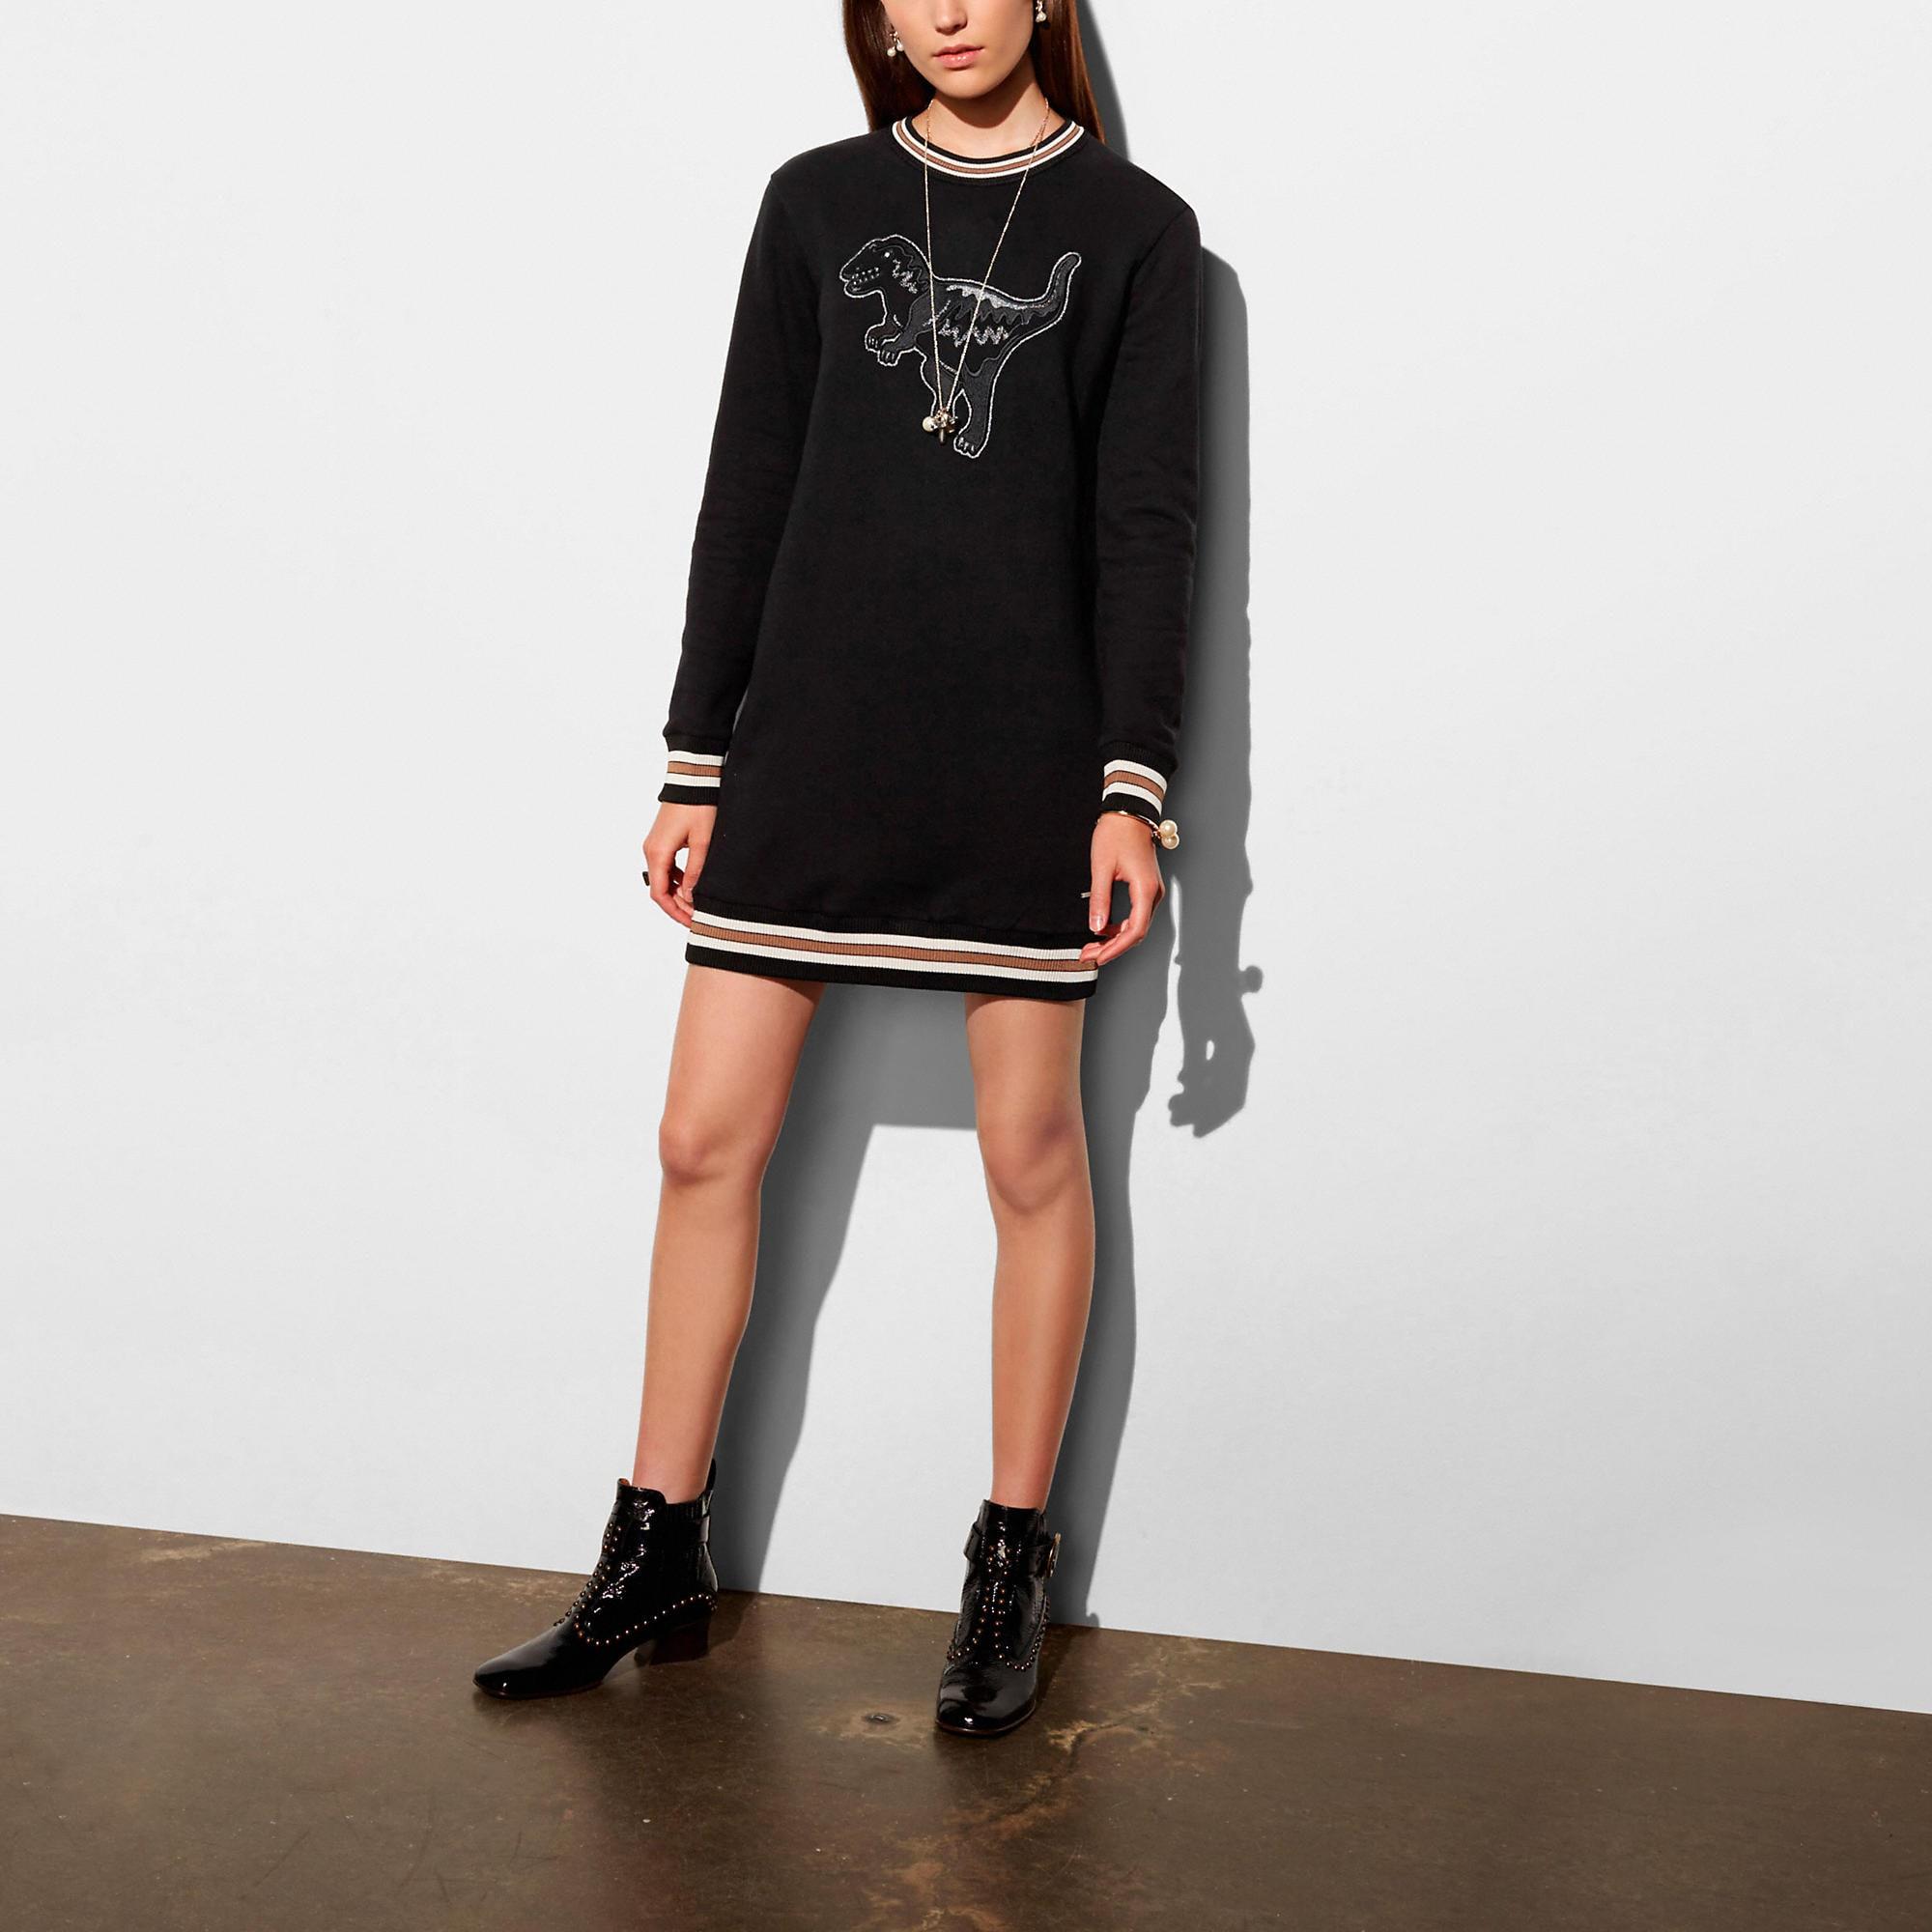 Coach Varsity T-Rex Sweatshirt Dress